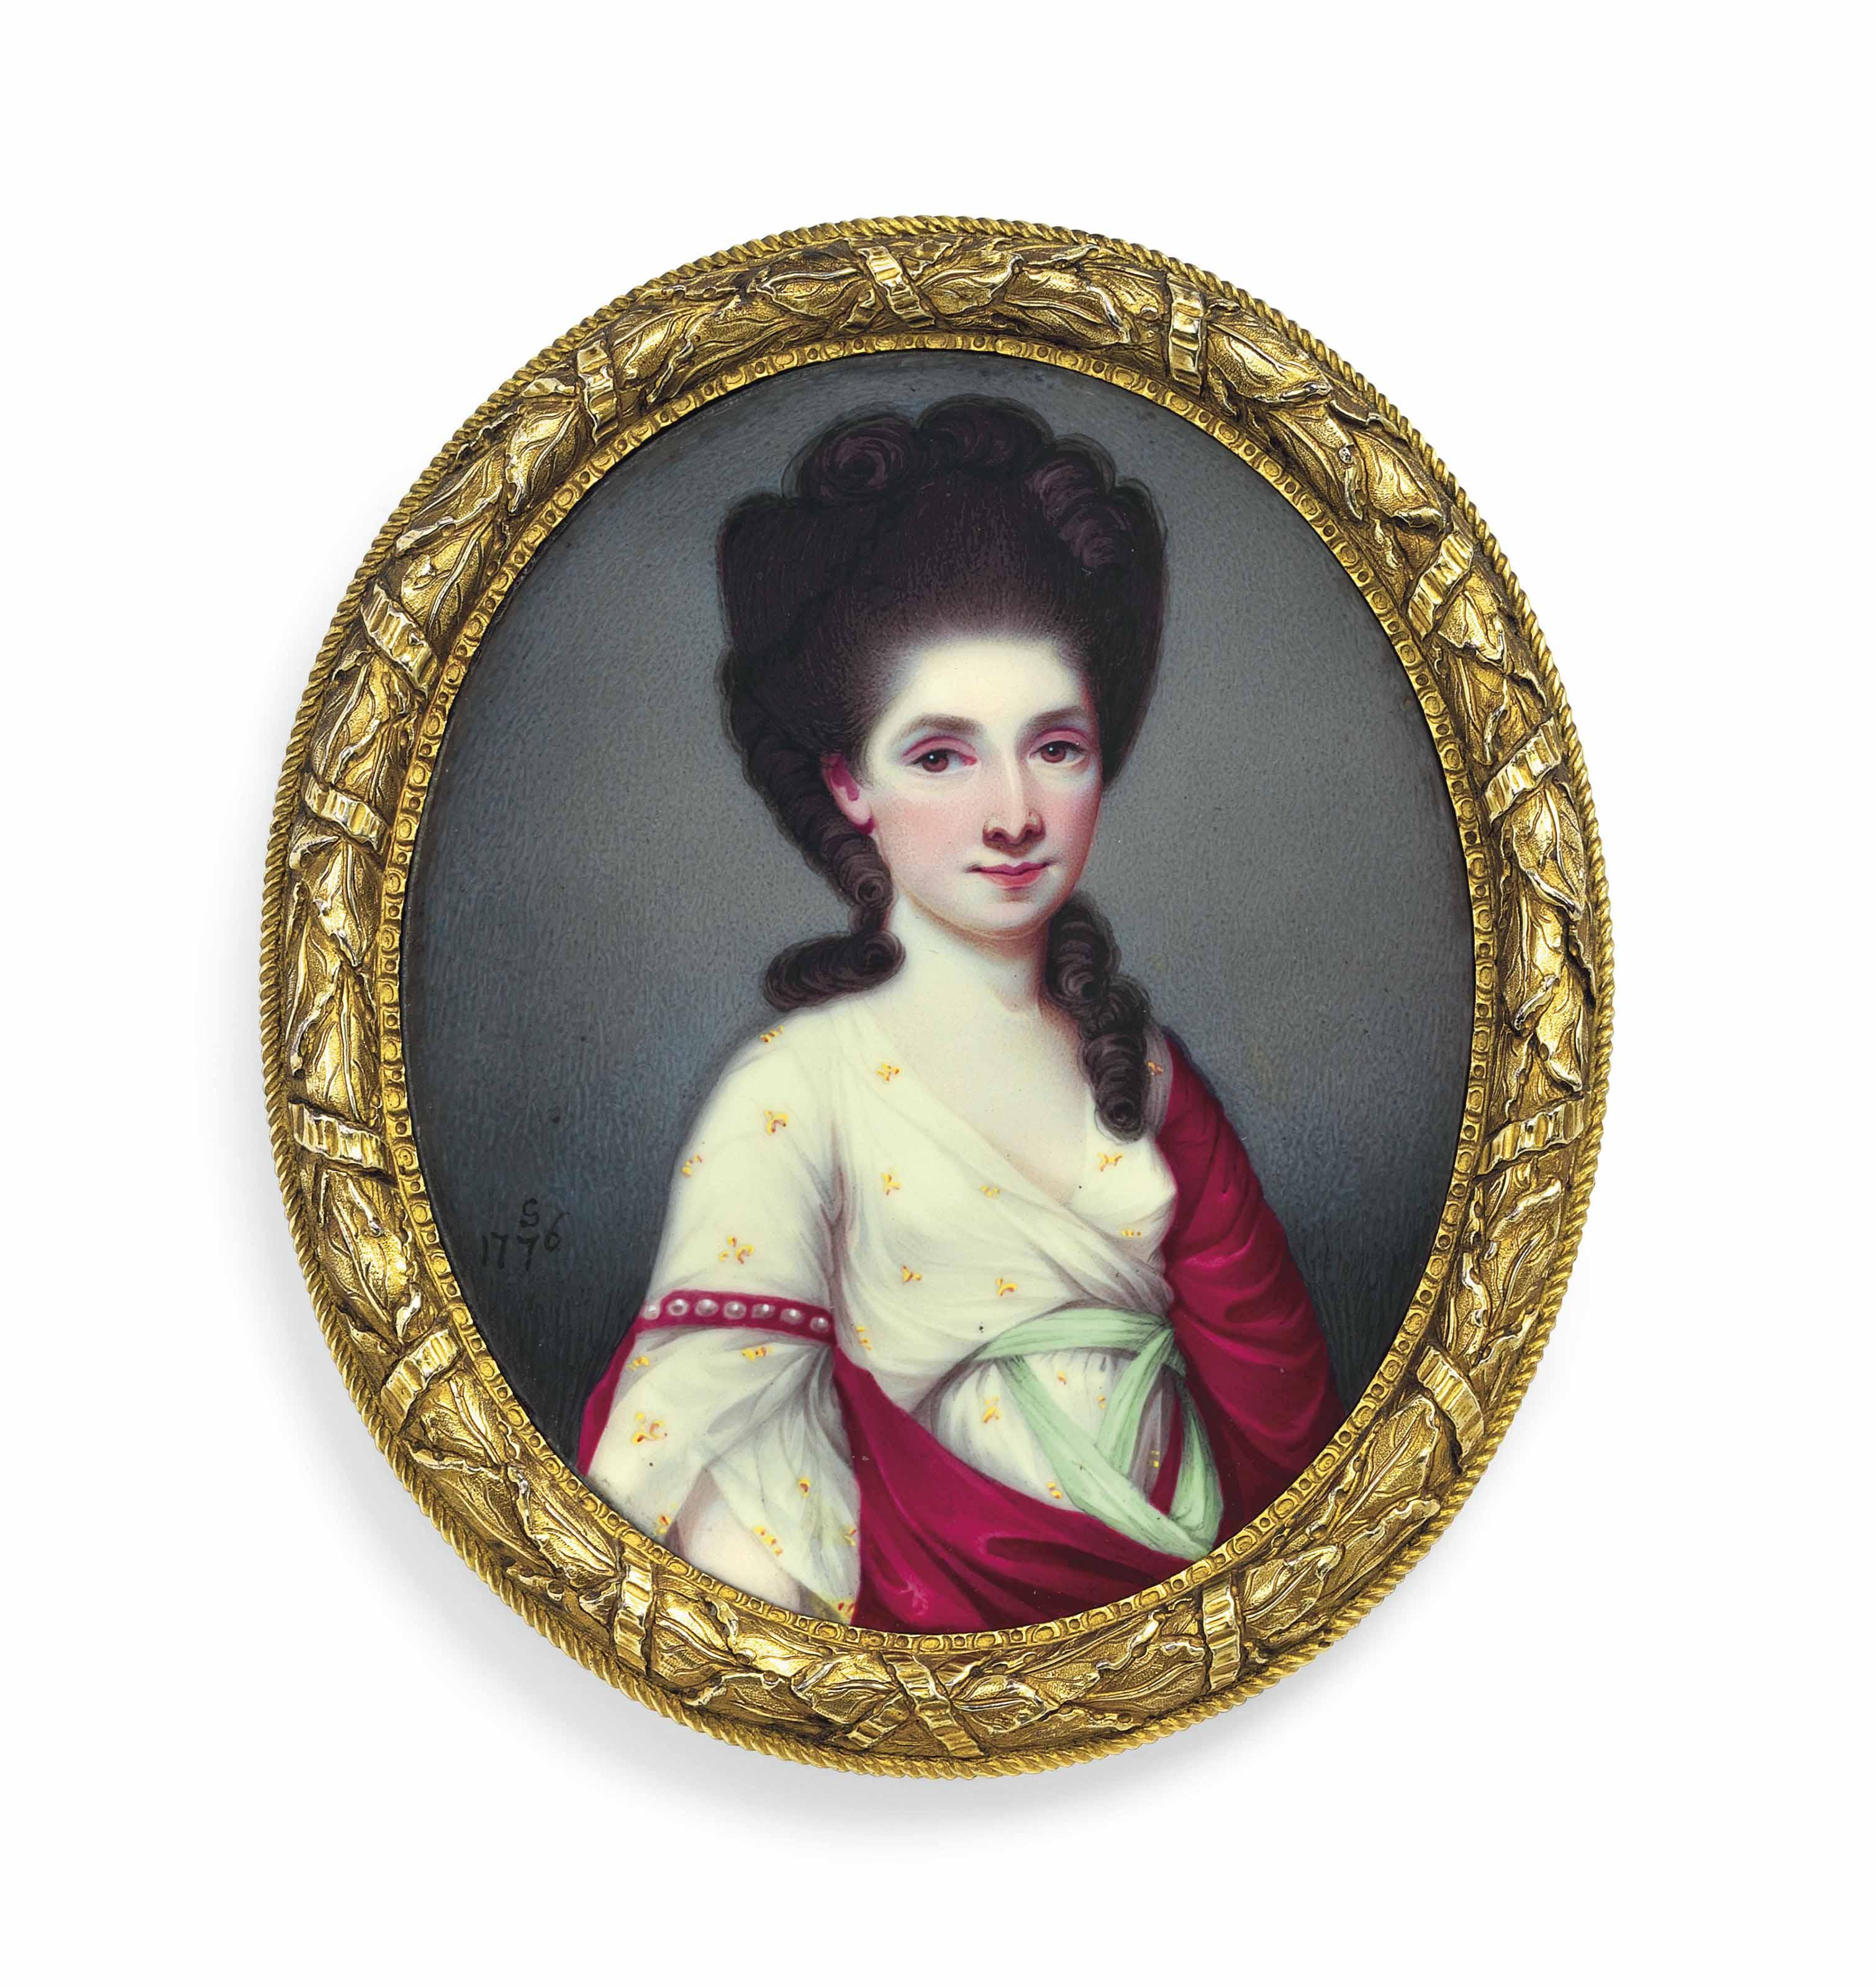 HENRY SPICER (BRITISH, 1743-18